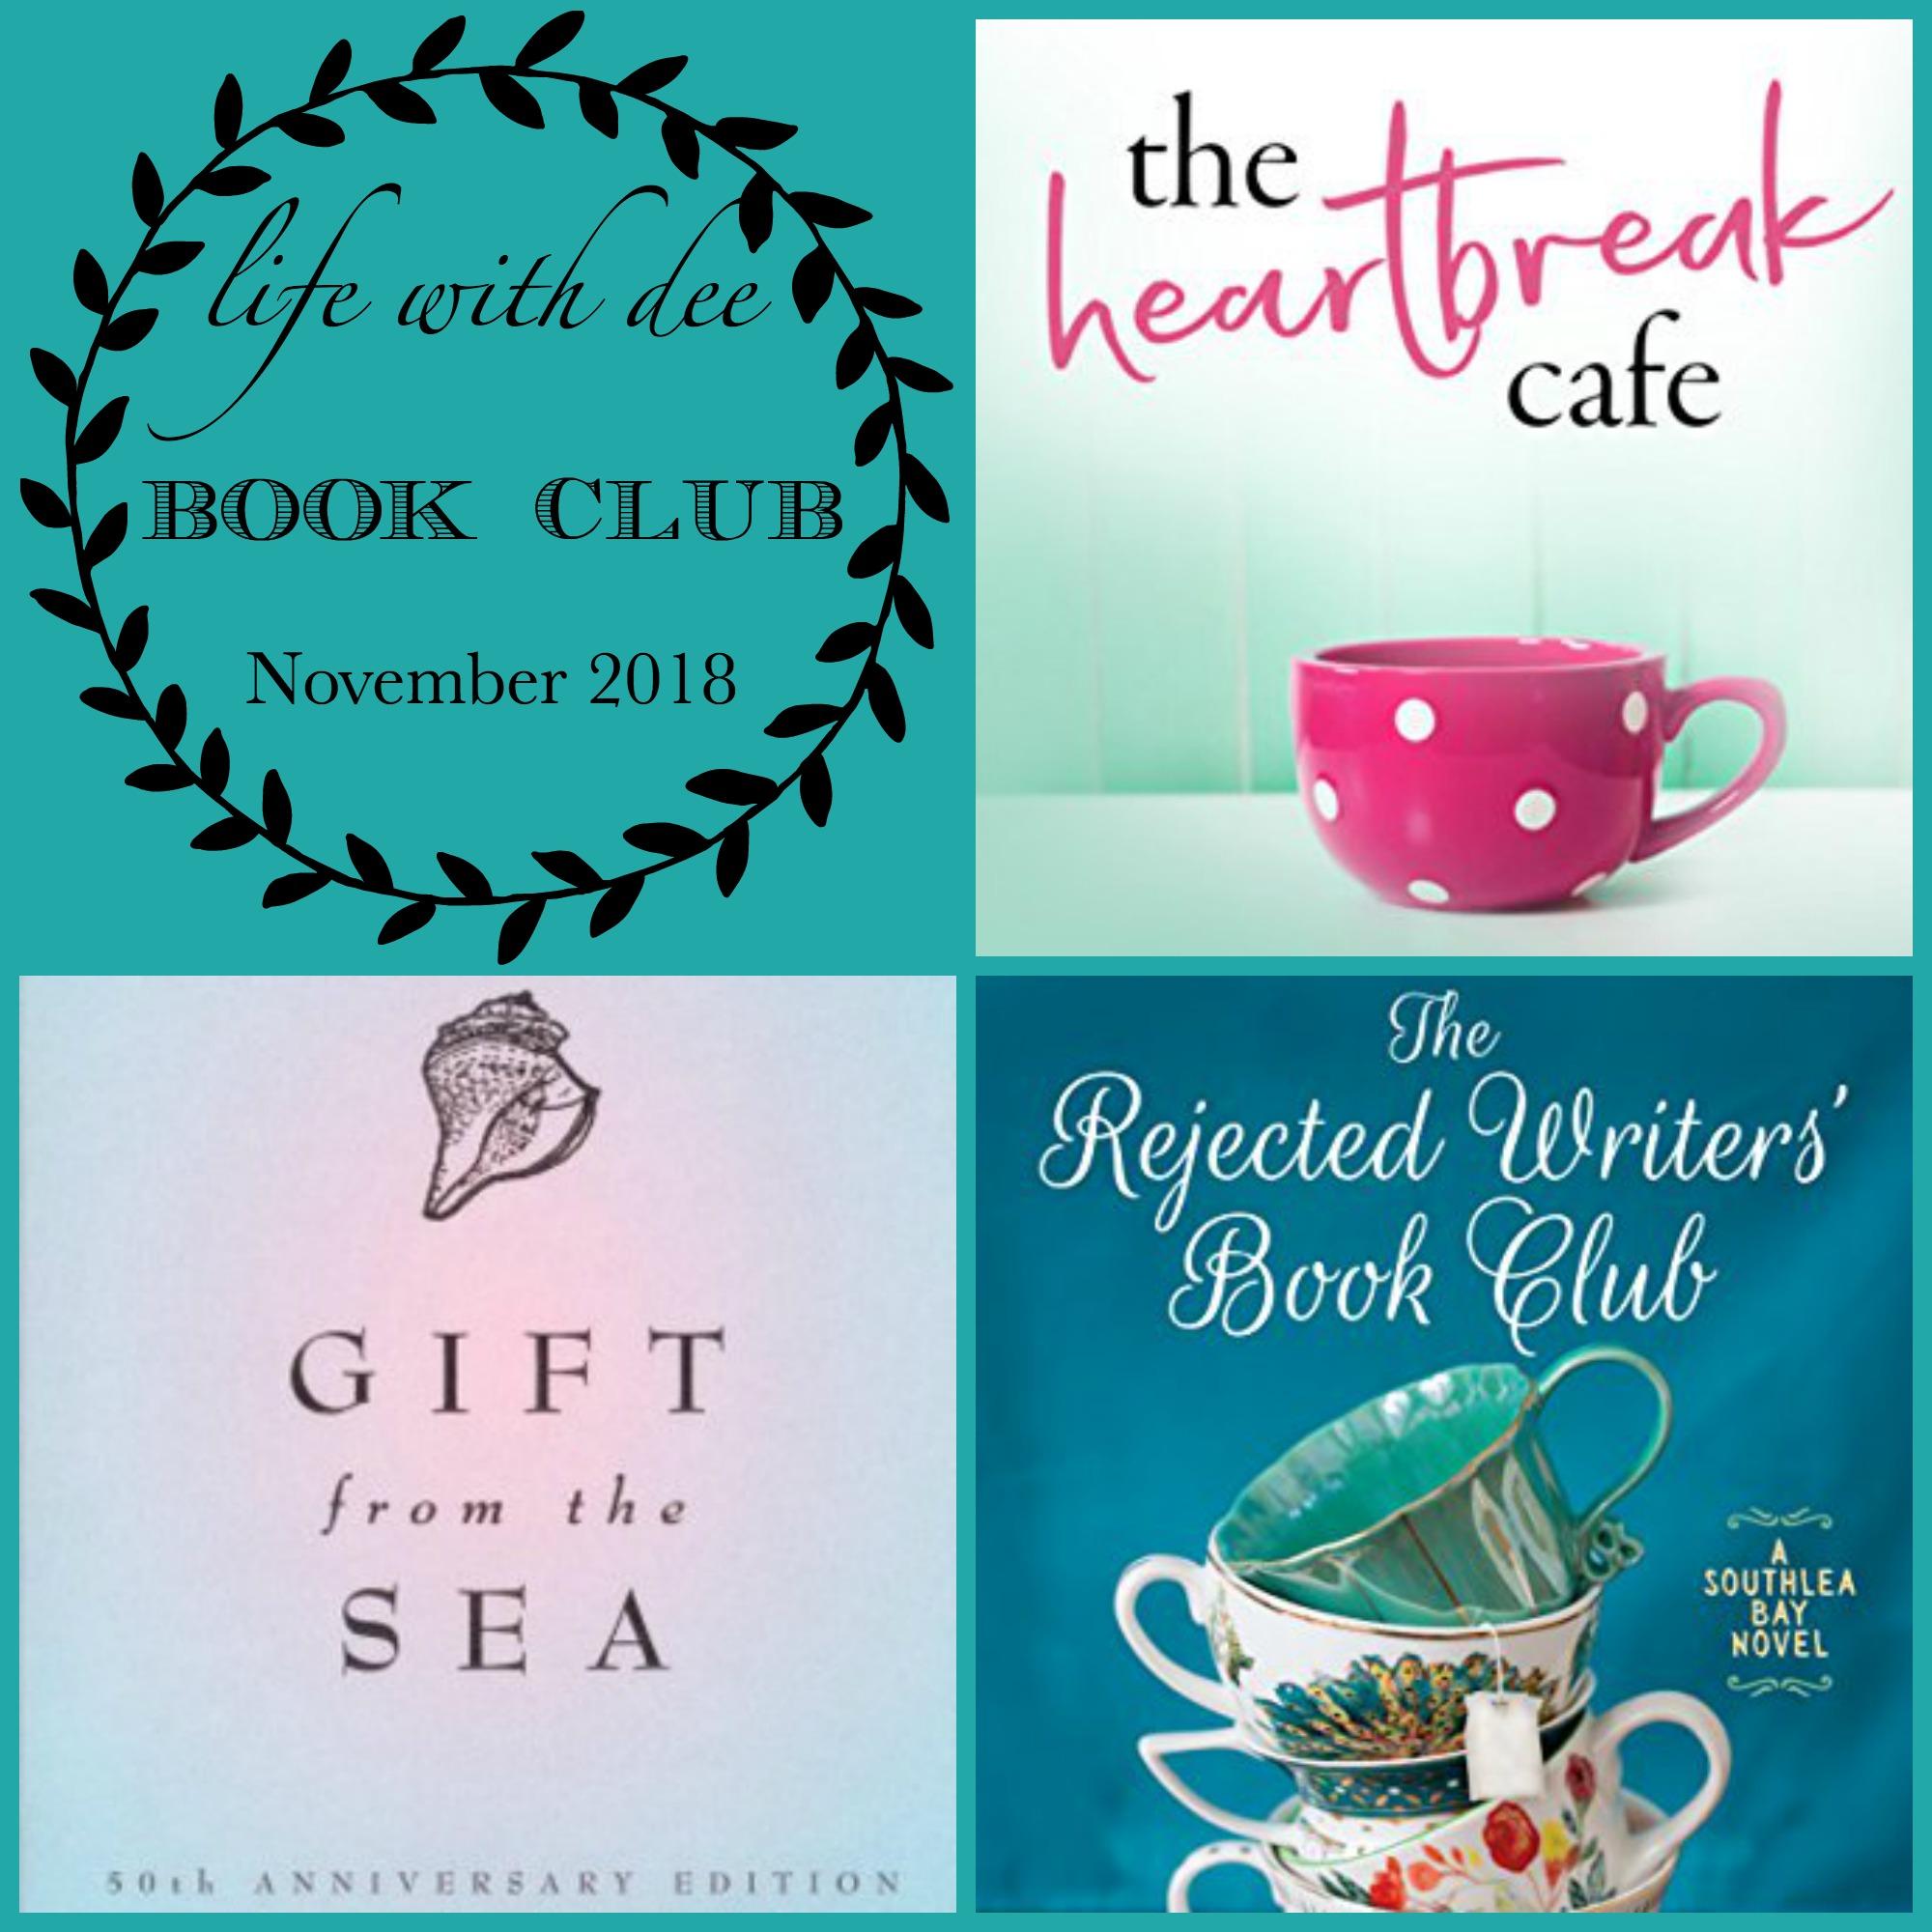 LWD Book Club November 2018